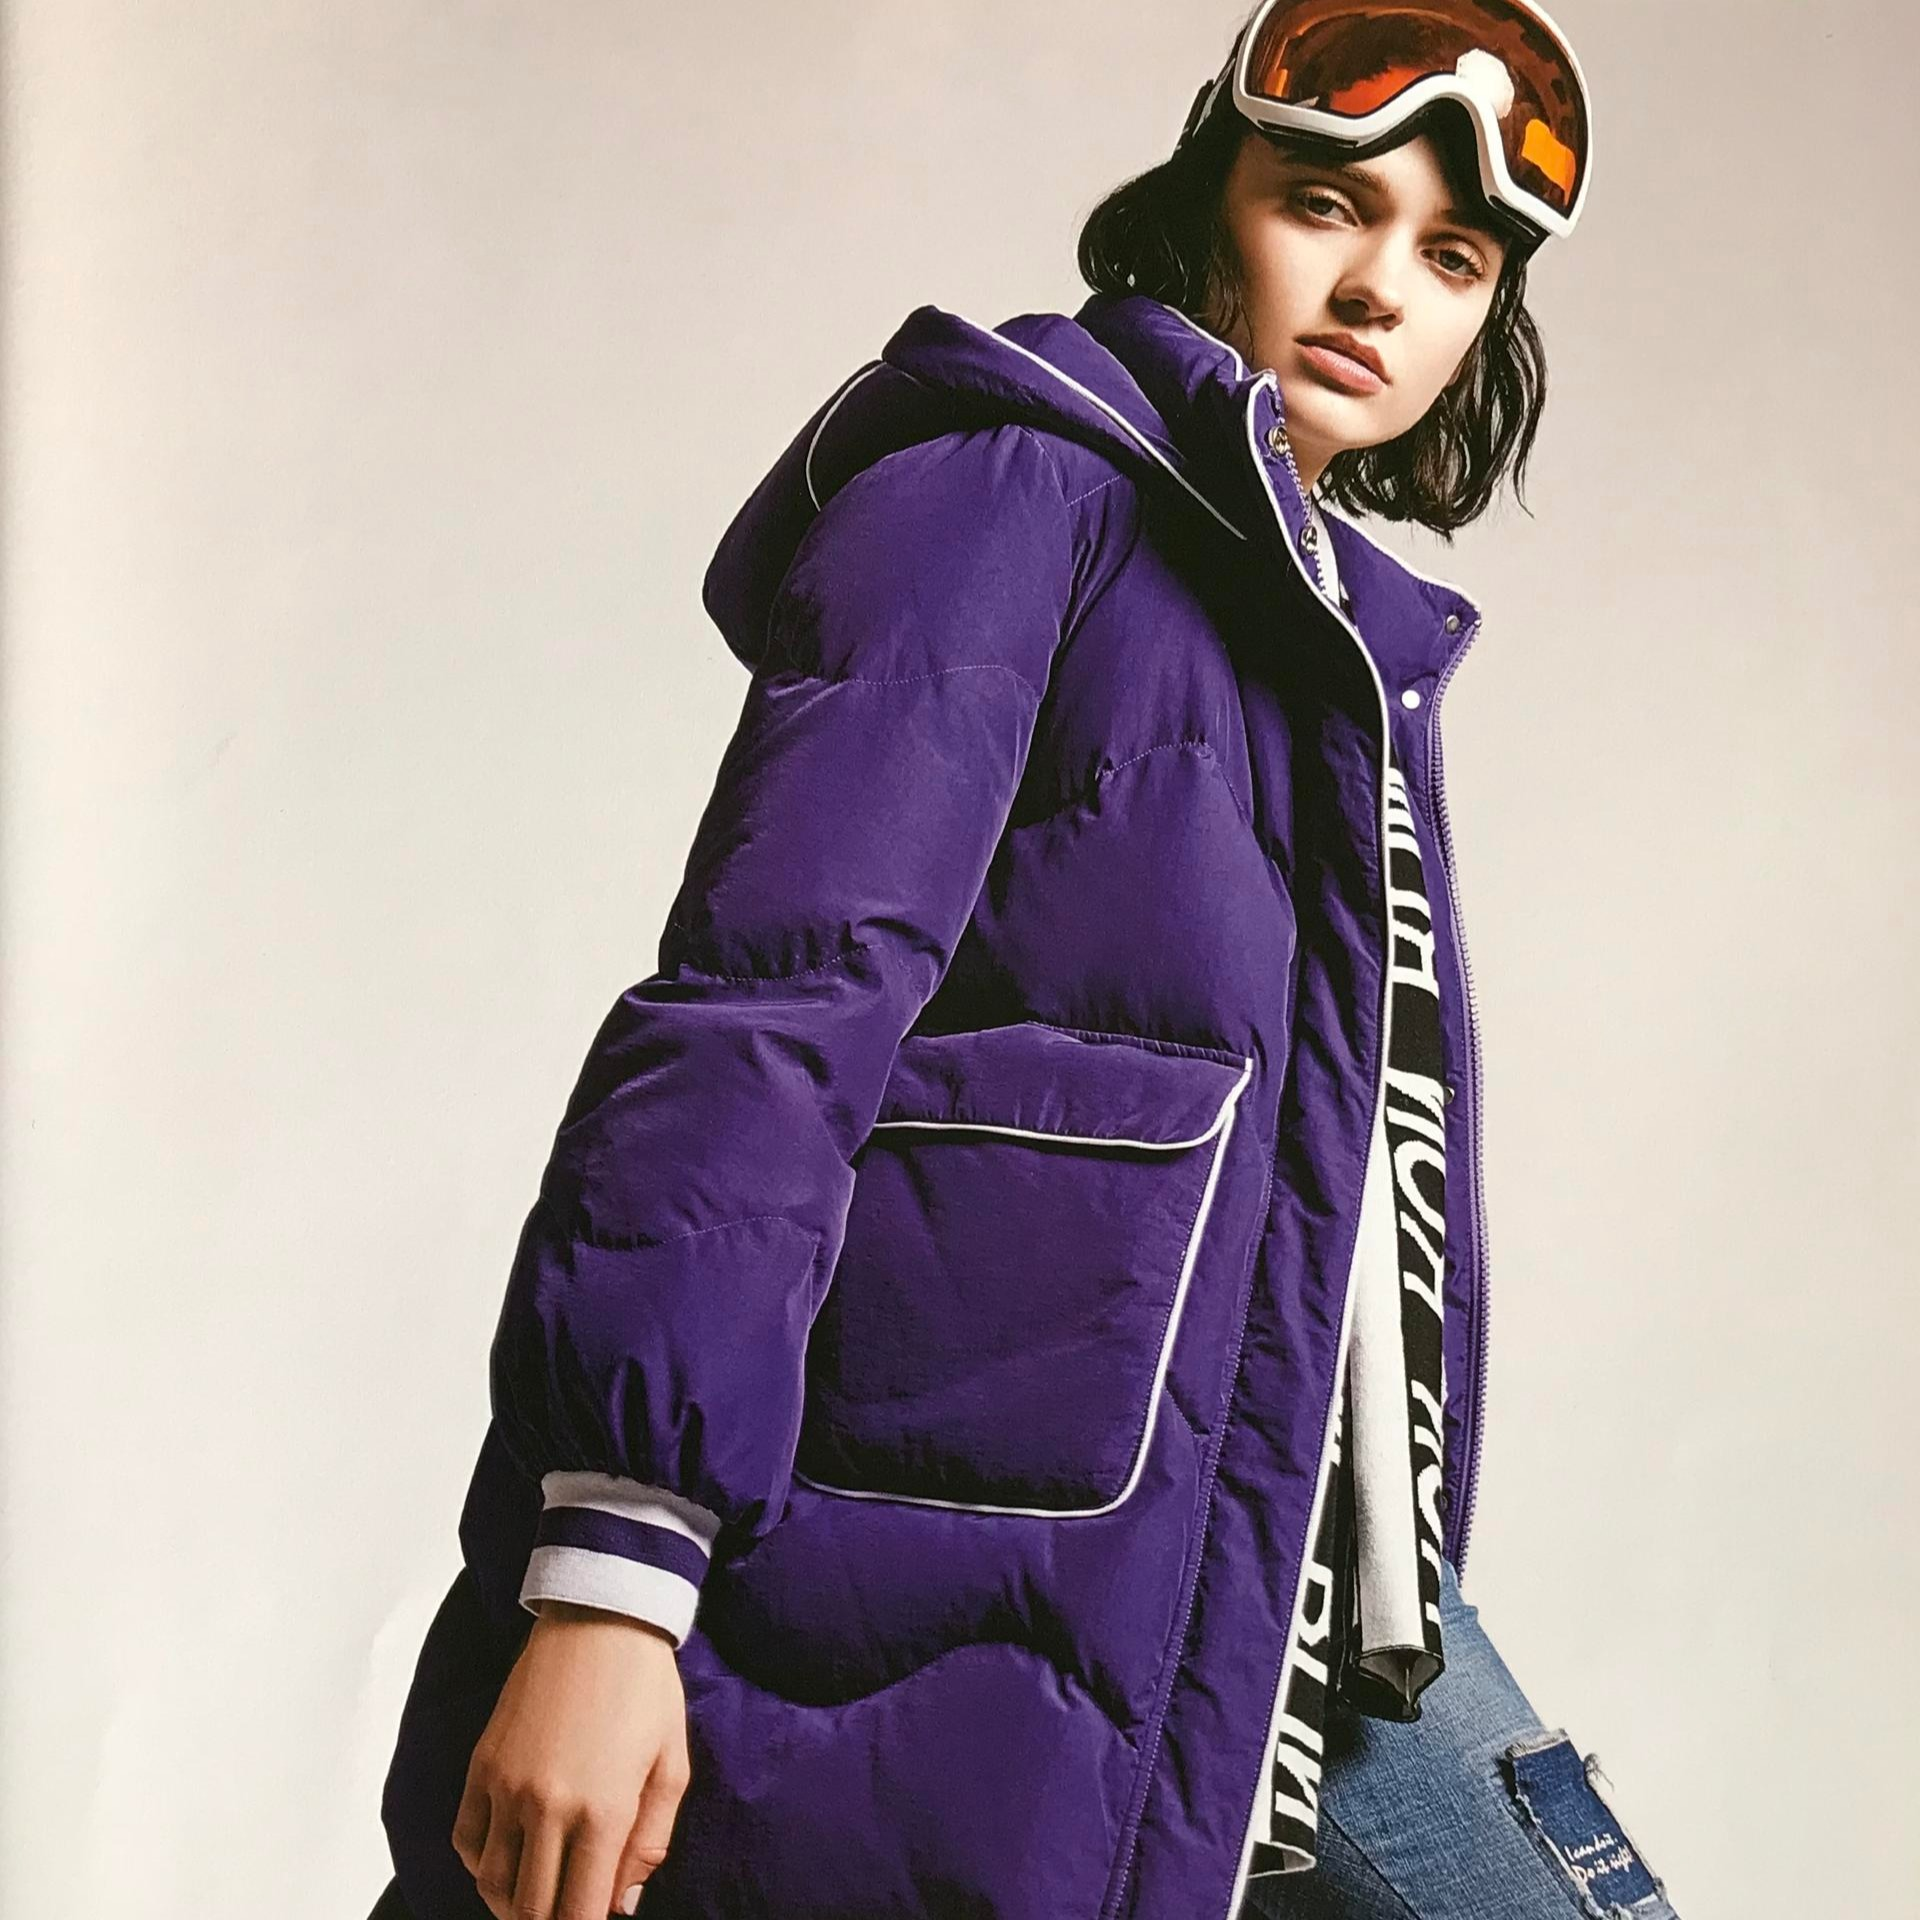 Wuhan brand discount women's clothing wholesale, brand women's clothing inventory wholesale